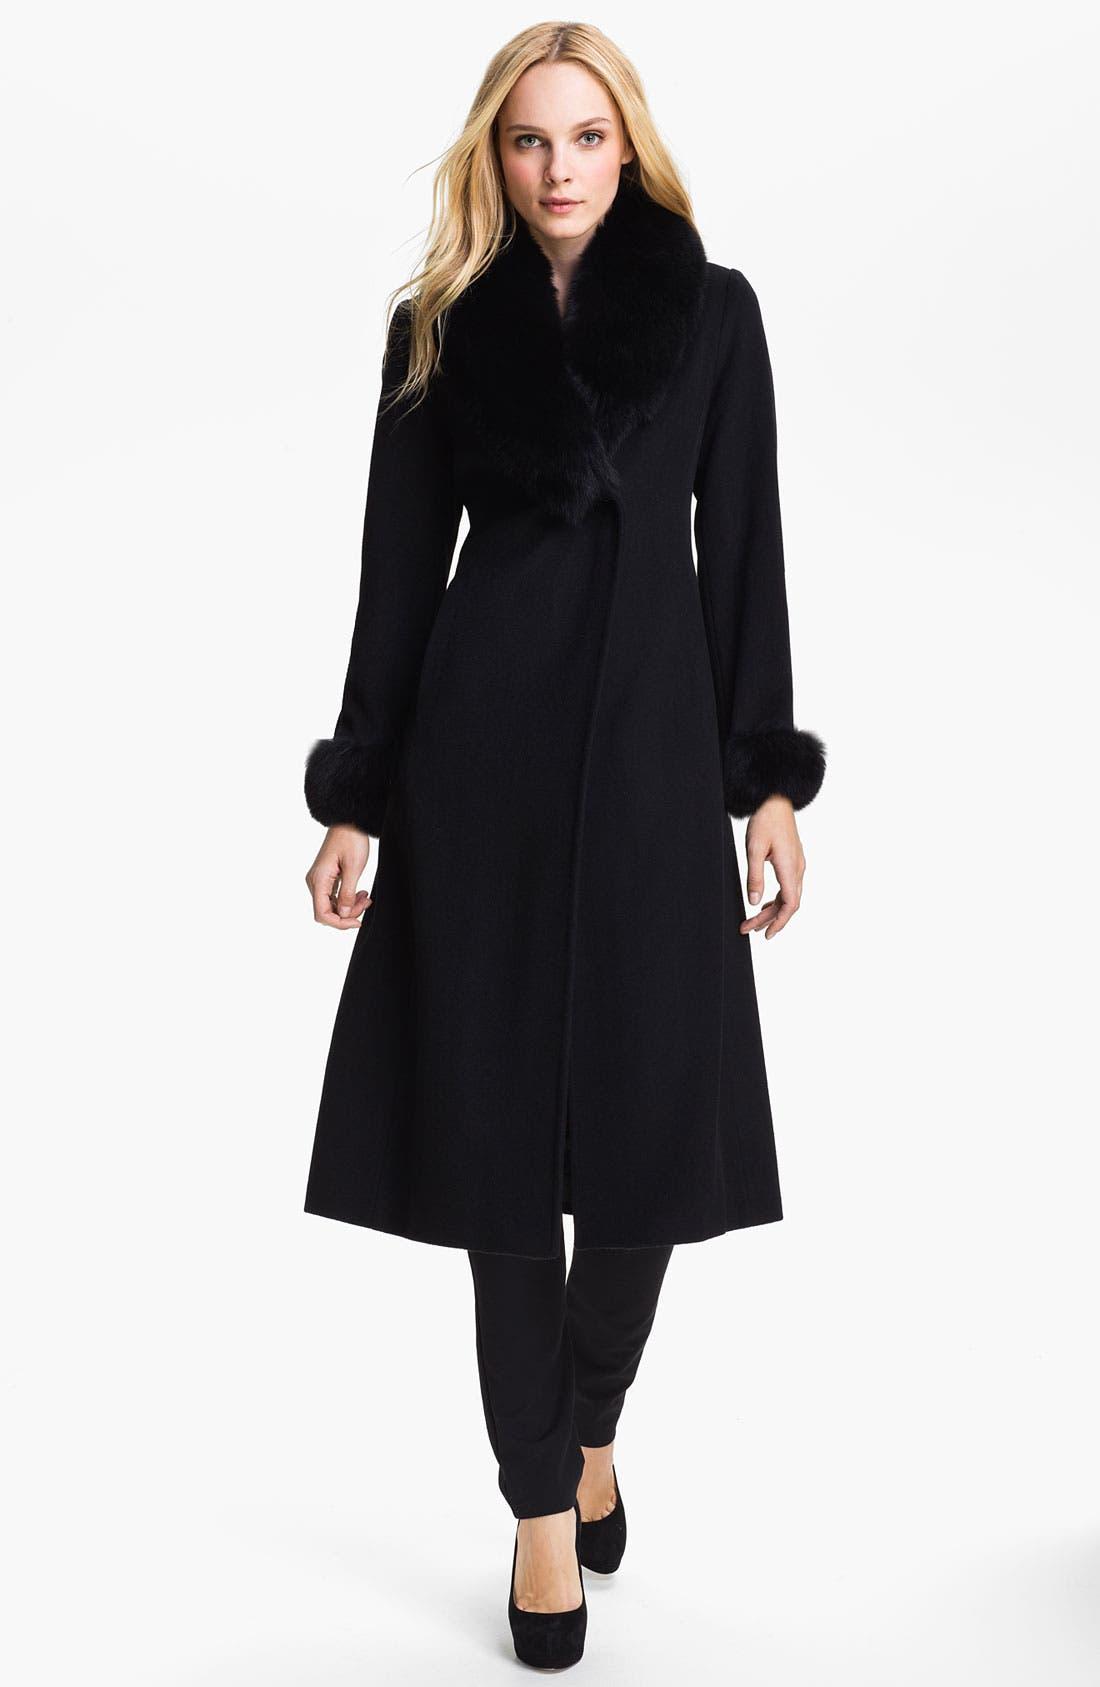 Alternate Image 1 Selected - Ellen Tracy Genuine Fox Fur Trim Wrap Coat (Petite)